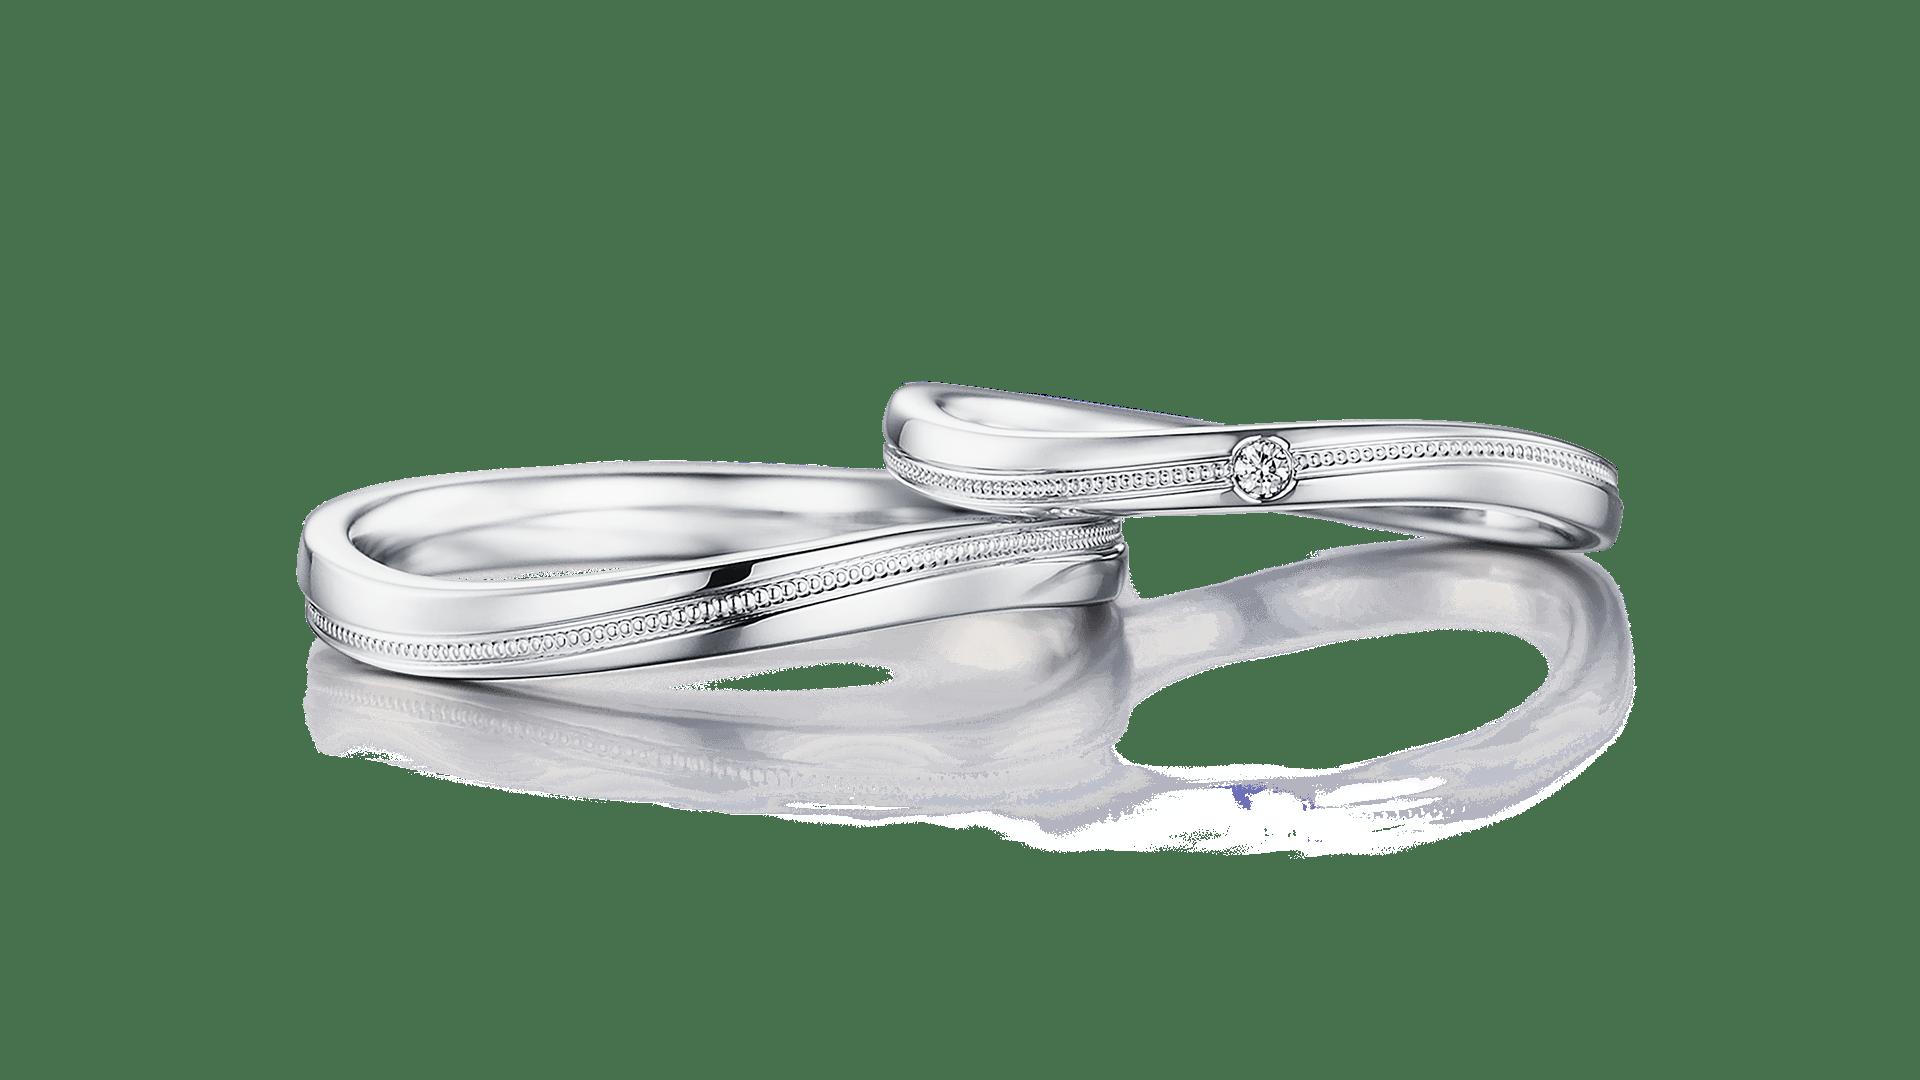 amphitrite アンフィトリテ | 結婚指輪サムネイル 1